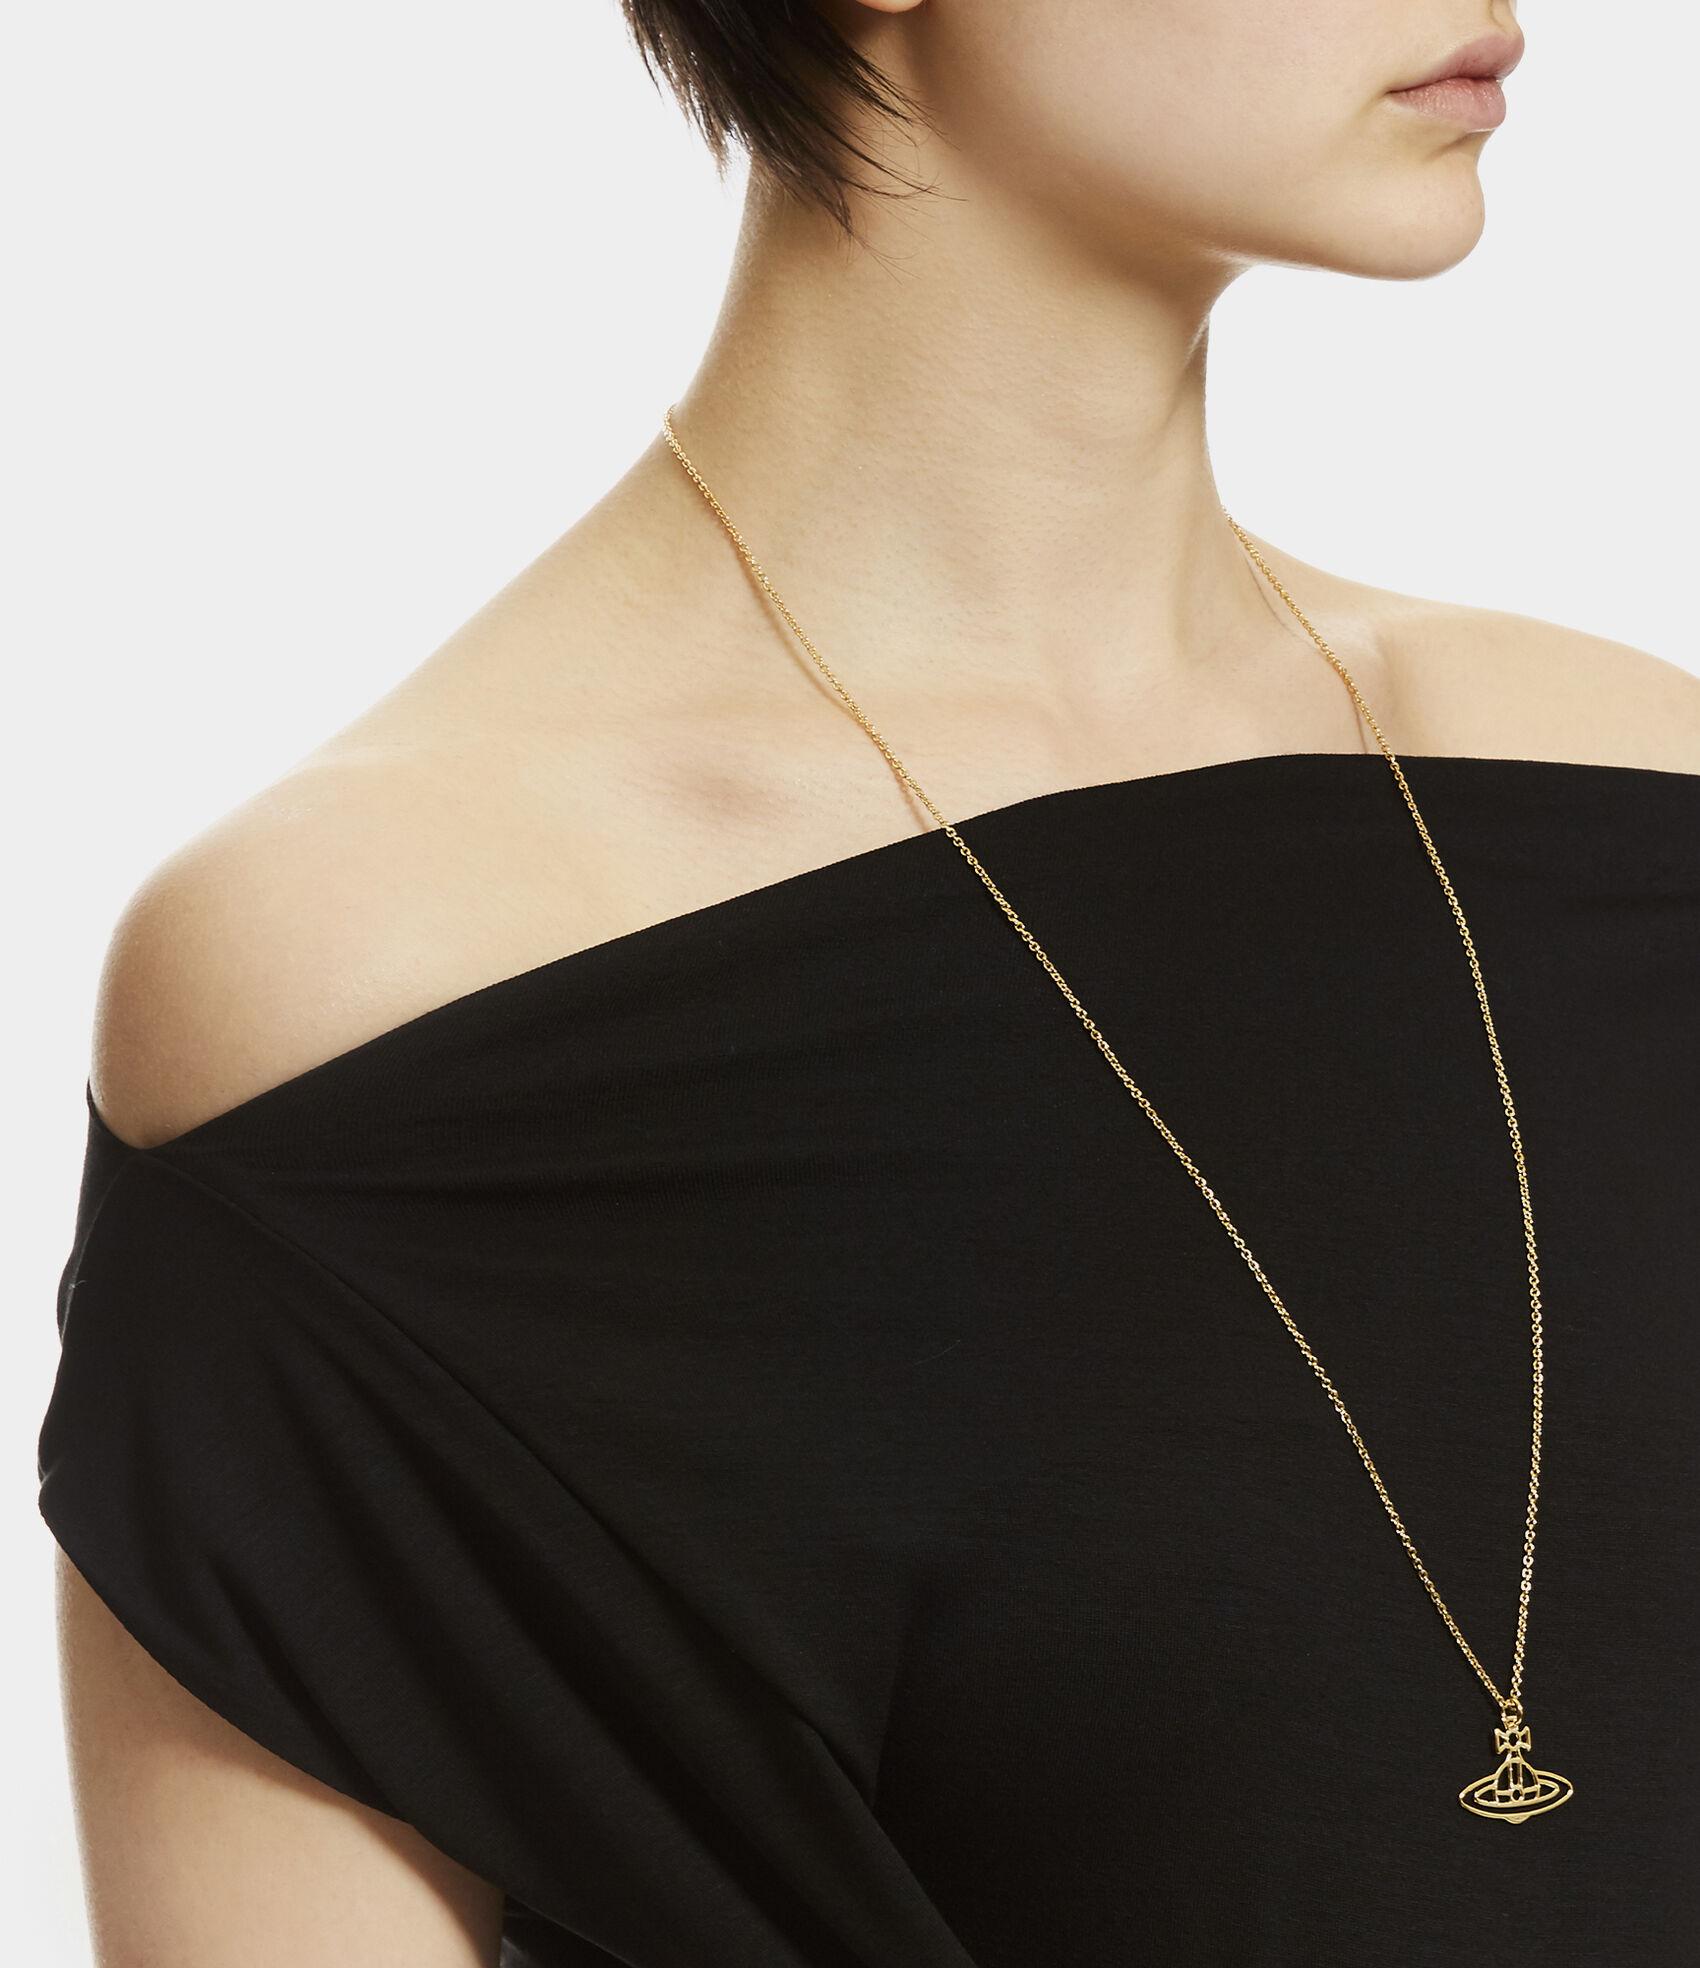 f98bb2a354582c Vivienne Westwood Necklaces | Women's Jewellery | Vivienne Westwood - THIN  LINES FLAT ORB PENDANT